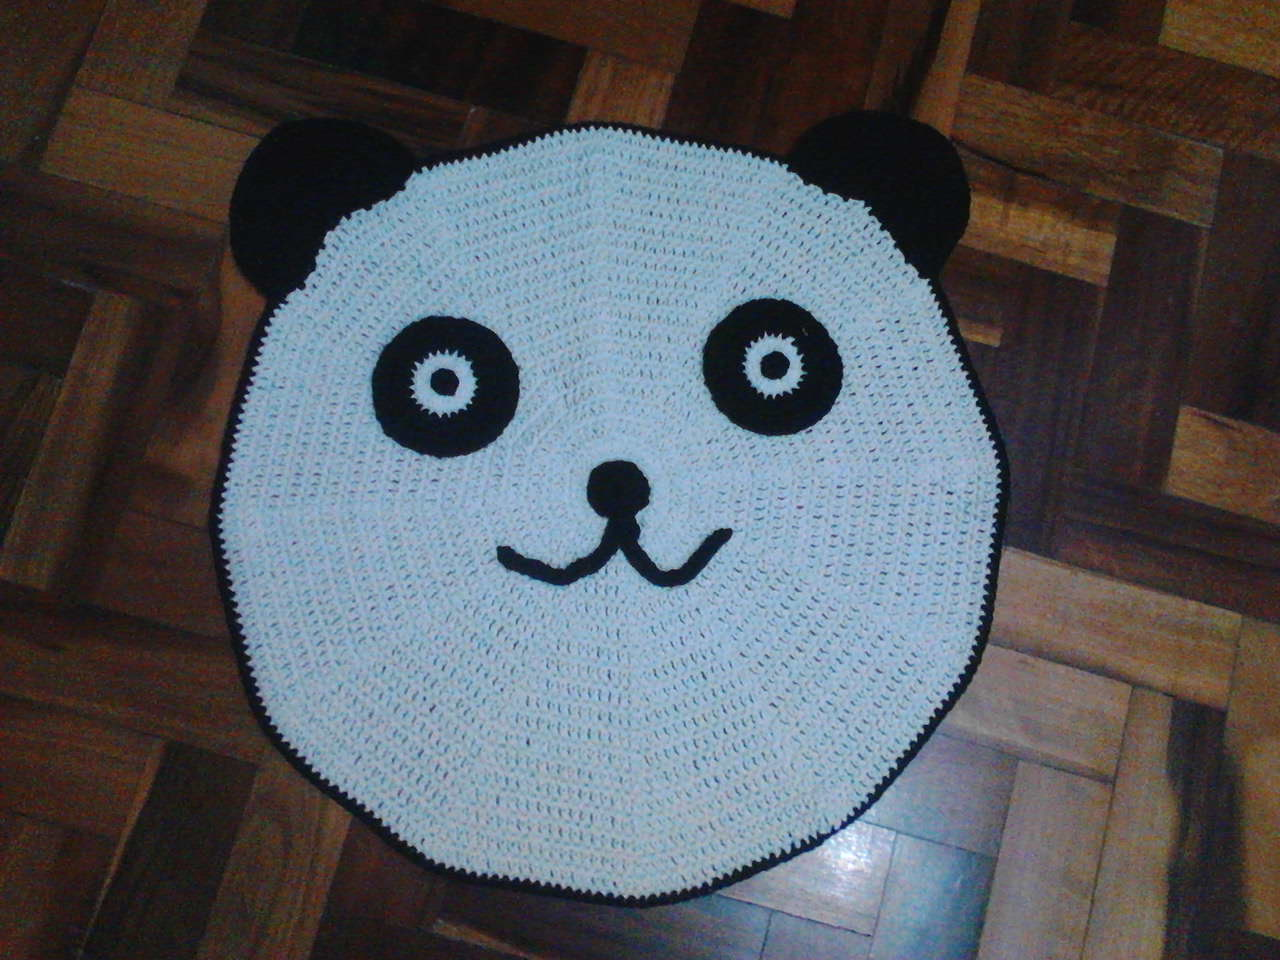 Tapete Urso Panda Lembrart Artesanato Elo7 ~ Tapete Infantil Para Quarto Urso